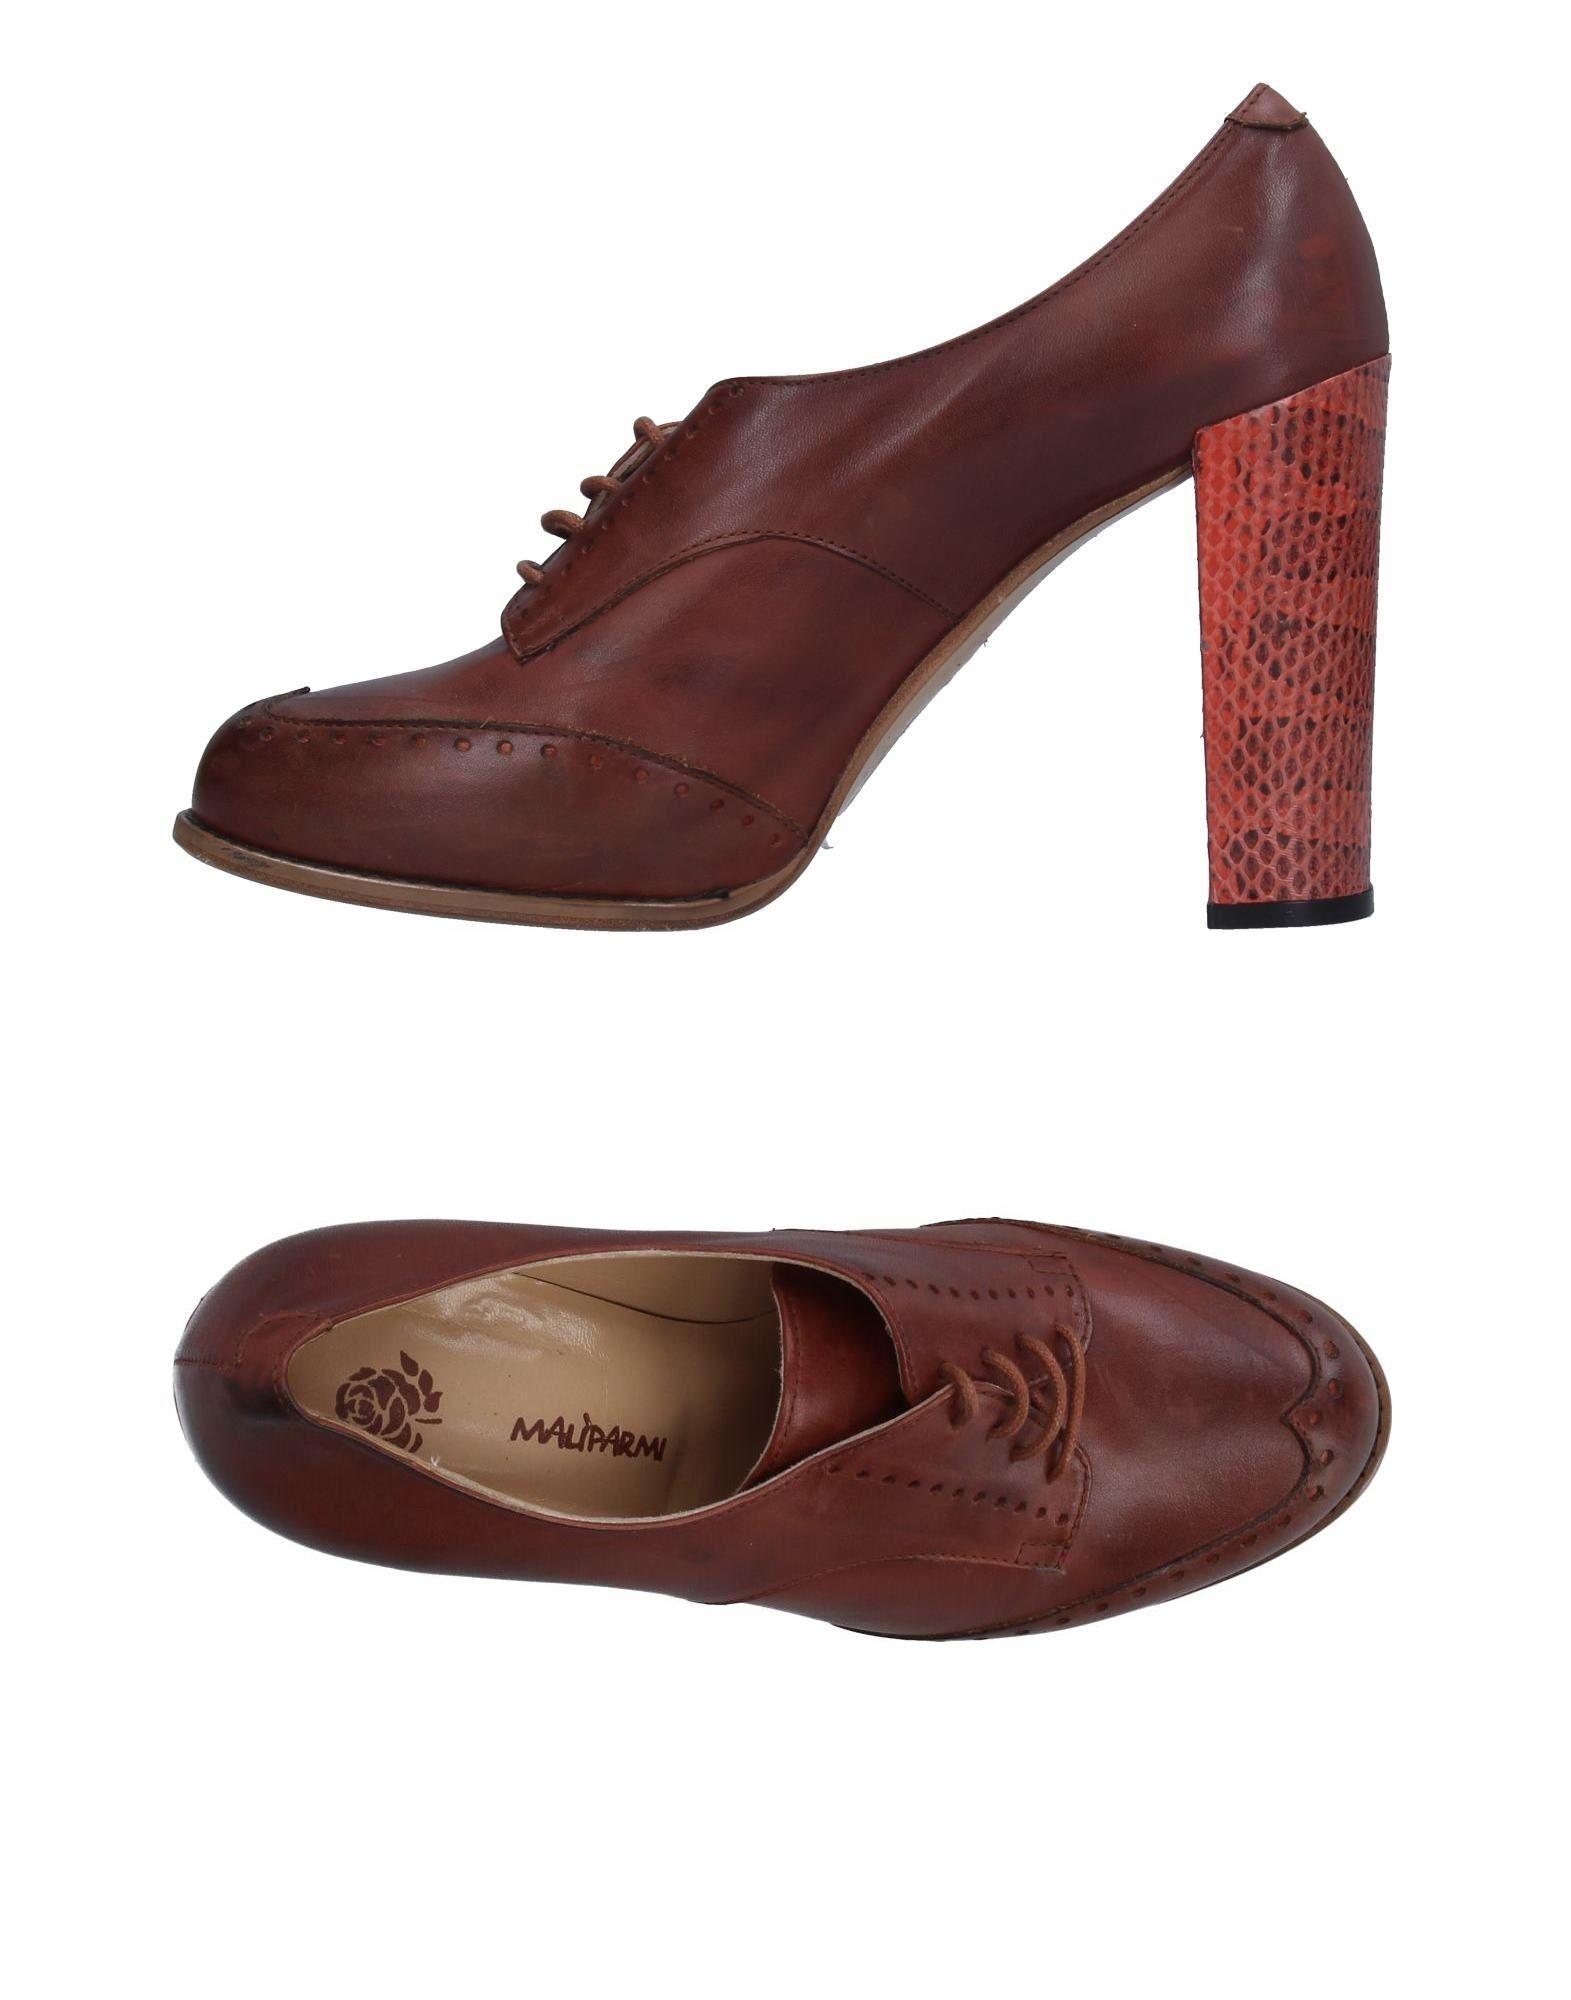 Stringate Scarpe Malìparmi Donna - 11327364BB Scarpe Stringate comode e distintive 4bf2f9